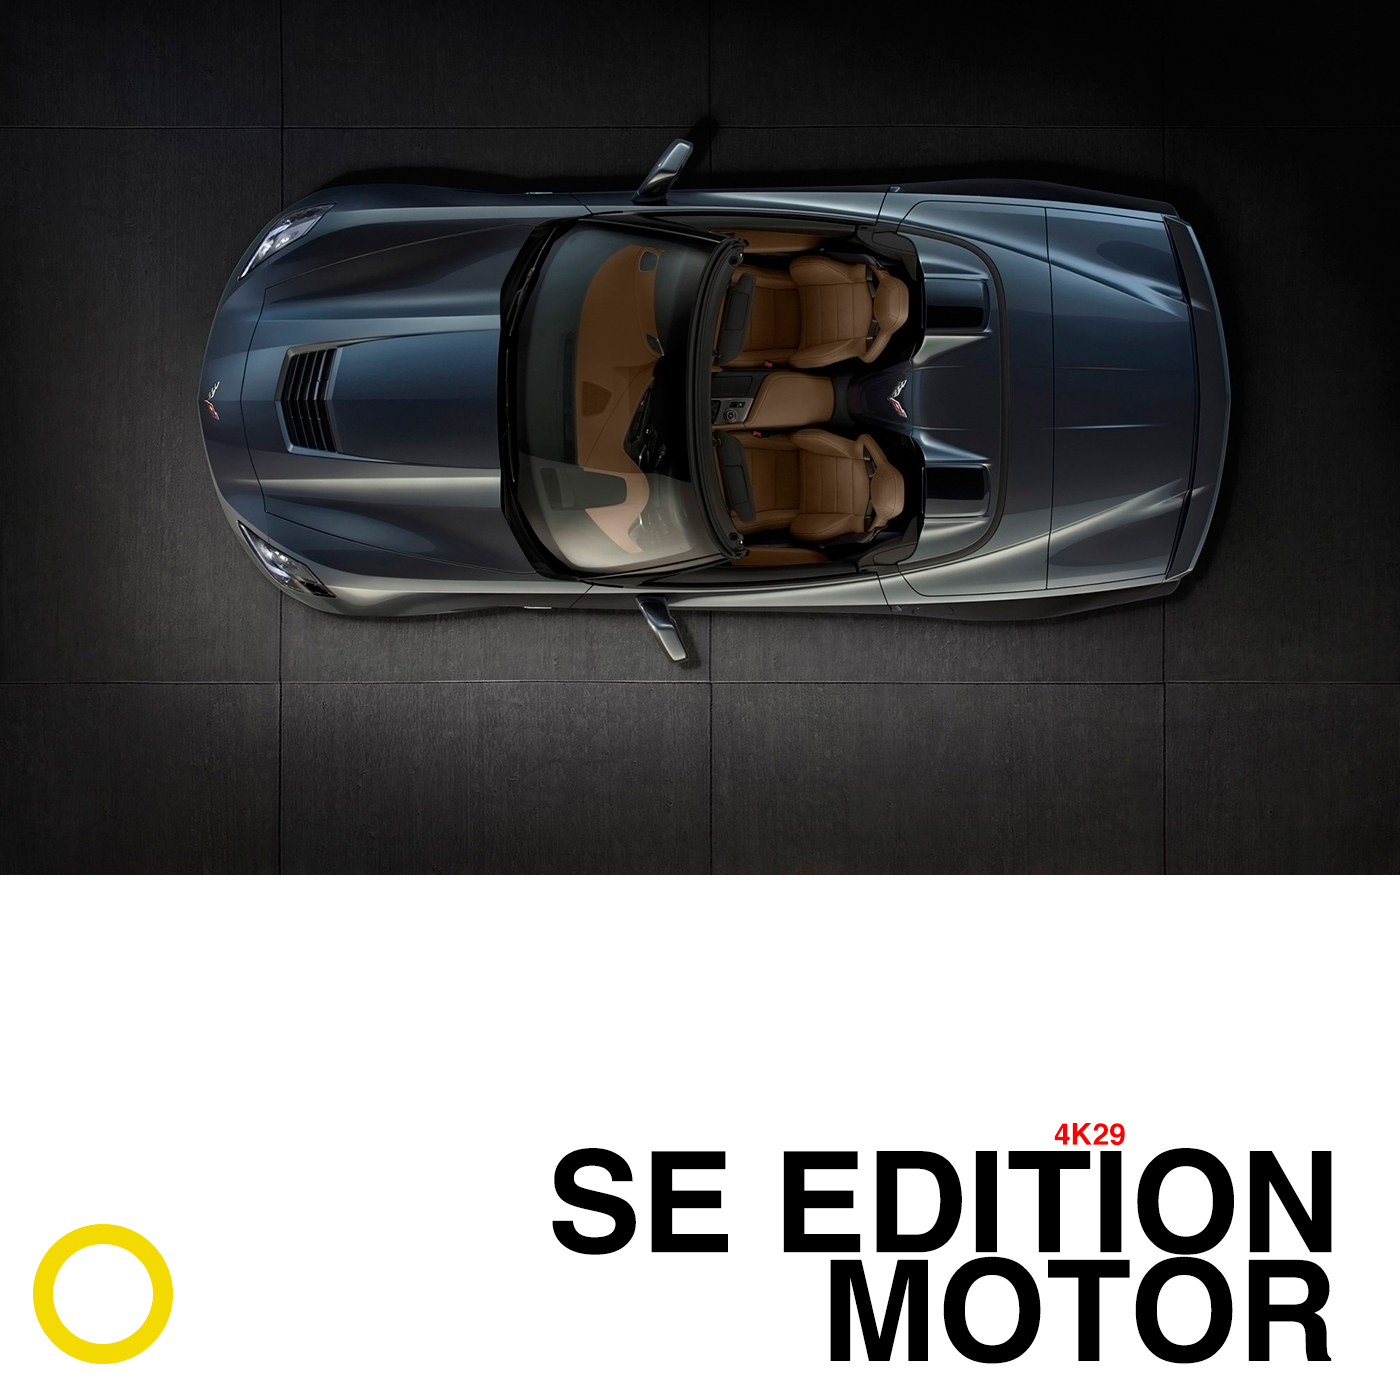 SE EDITION MOTOR 4K29